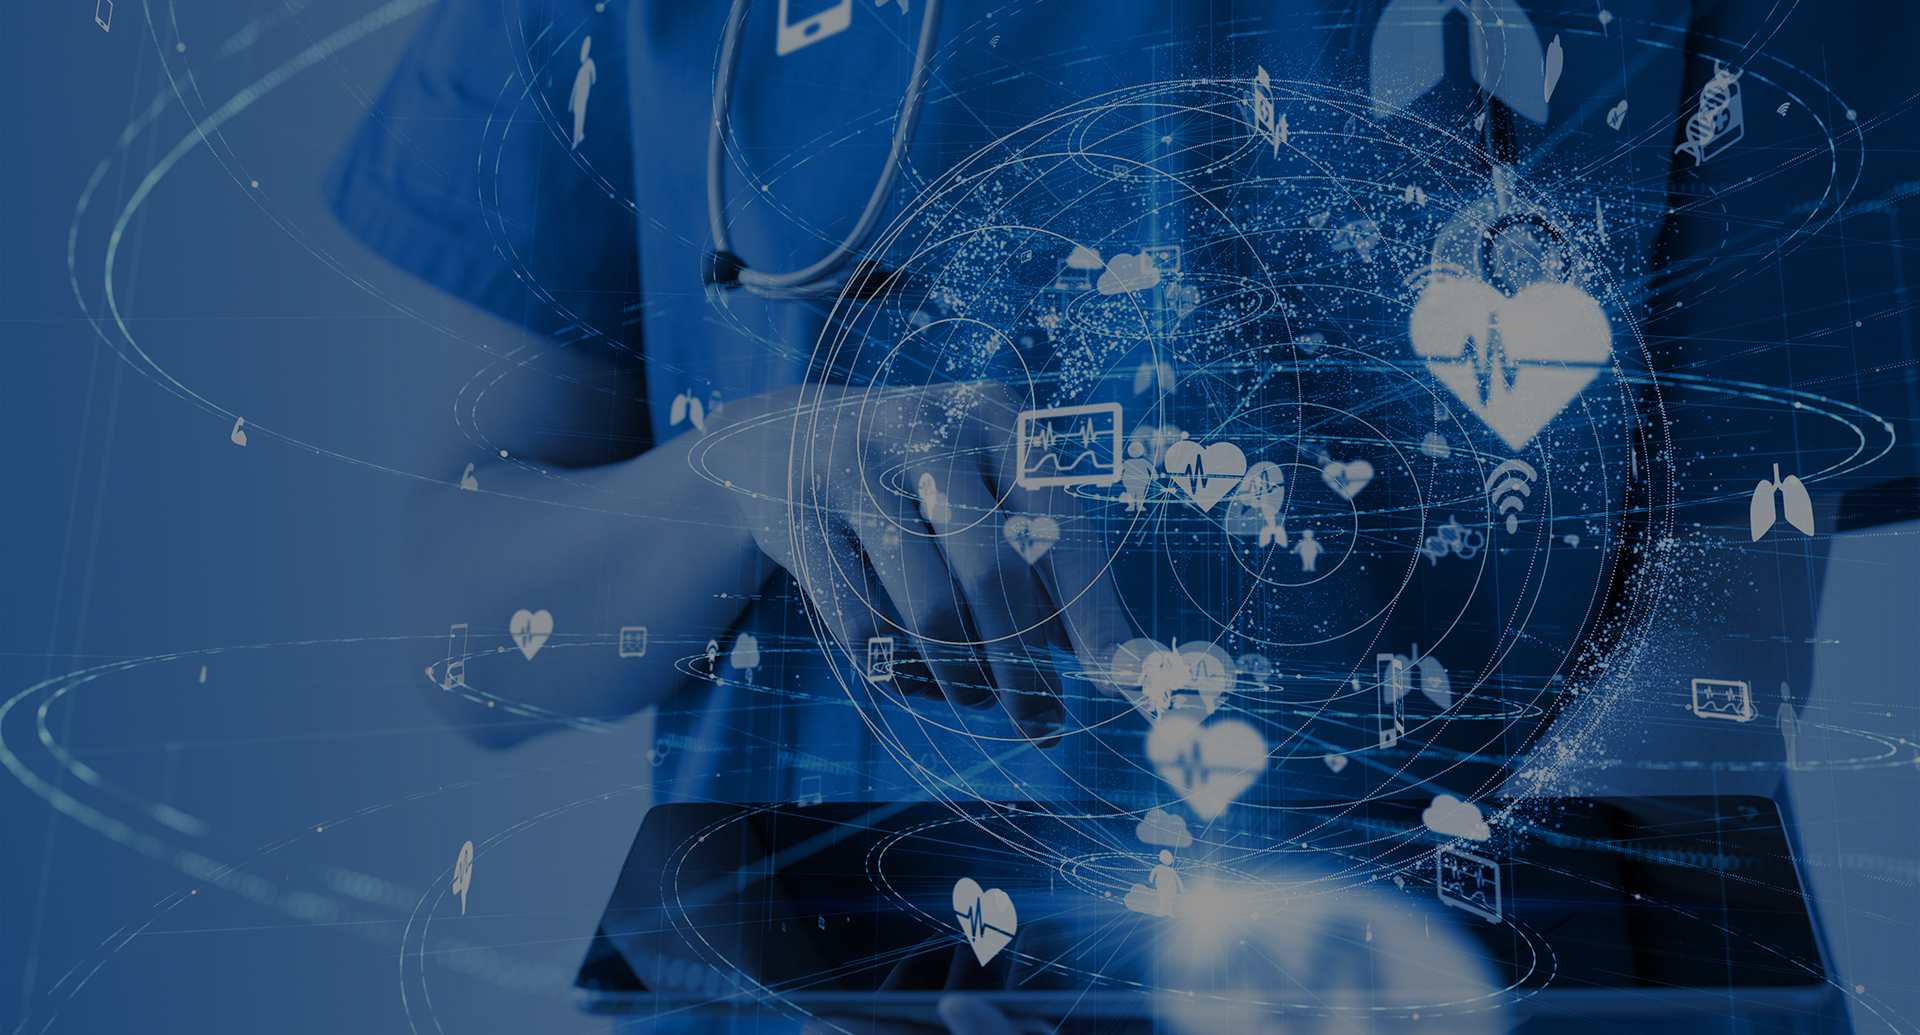 healthcare technology concept